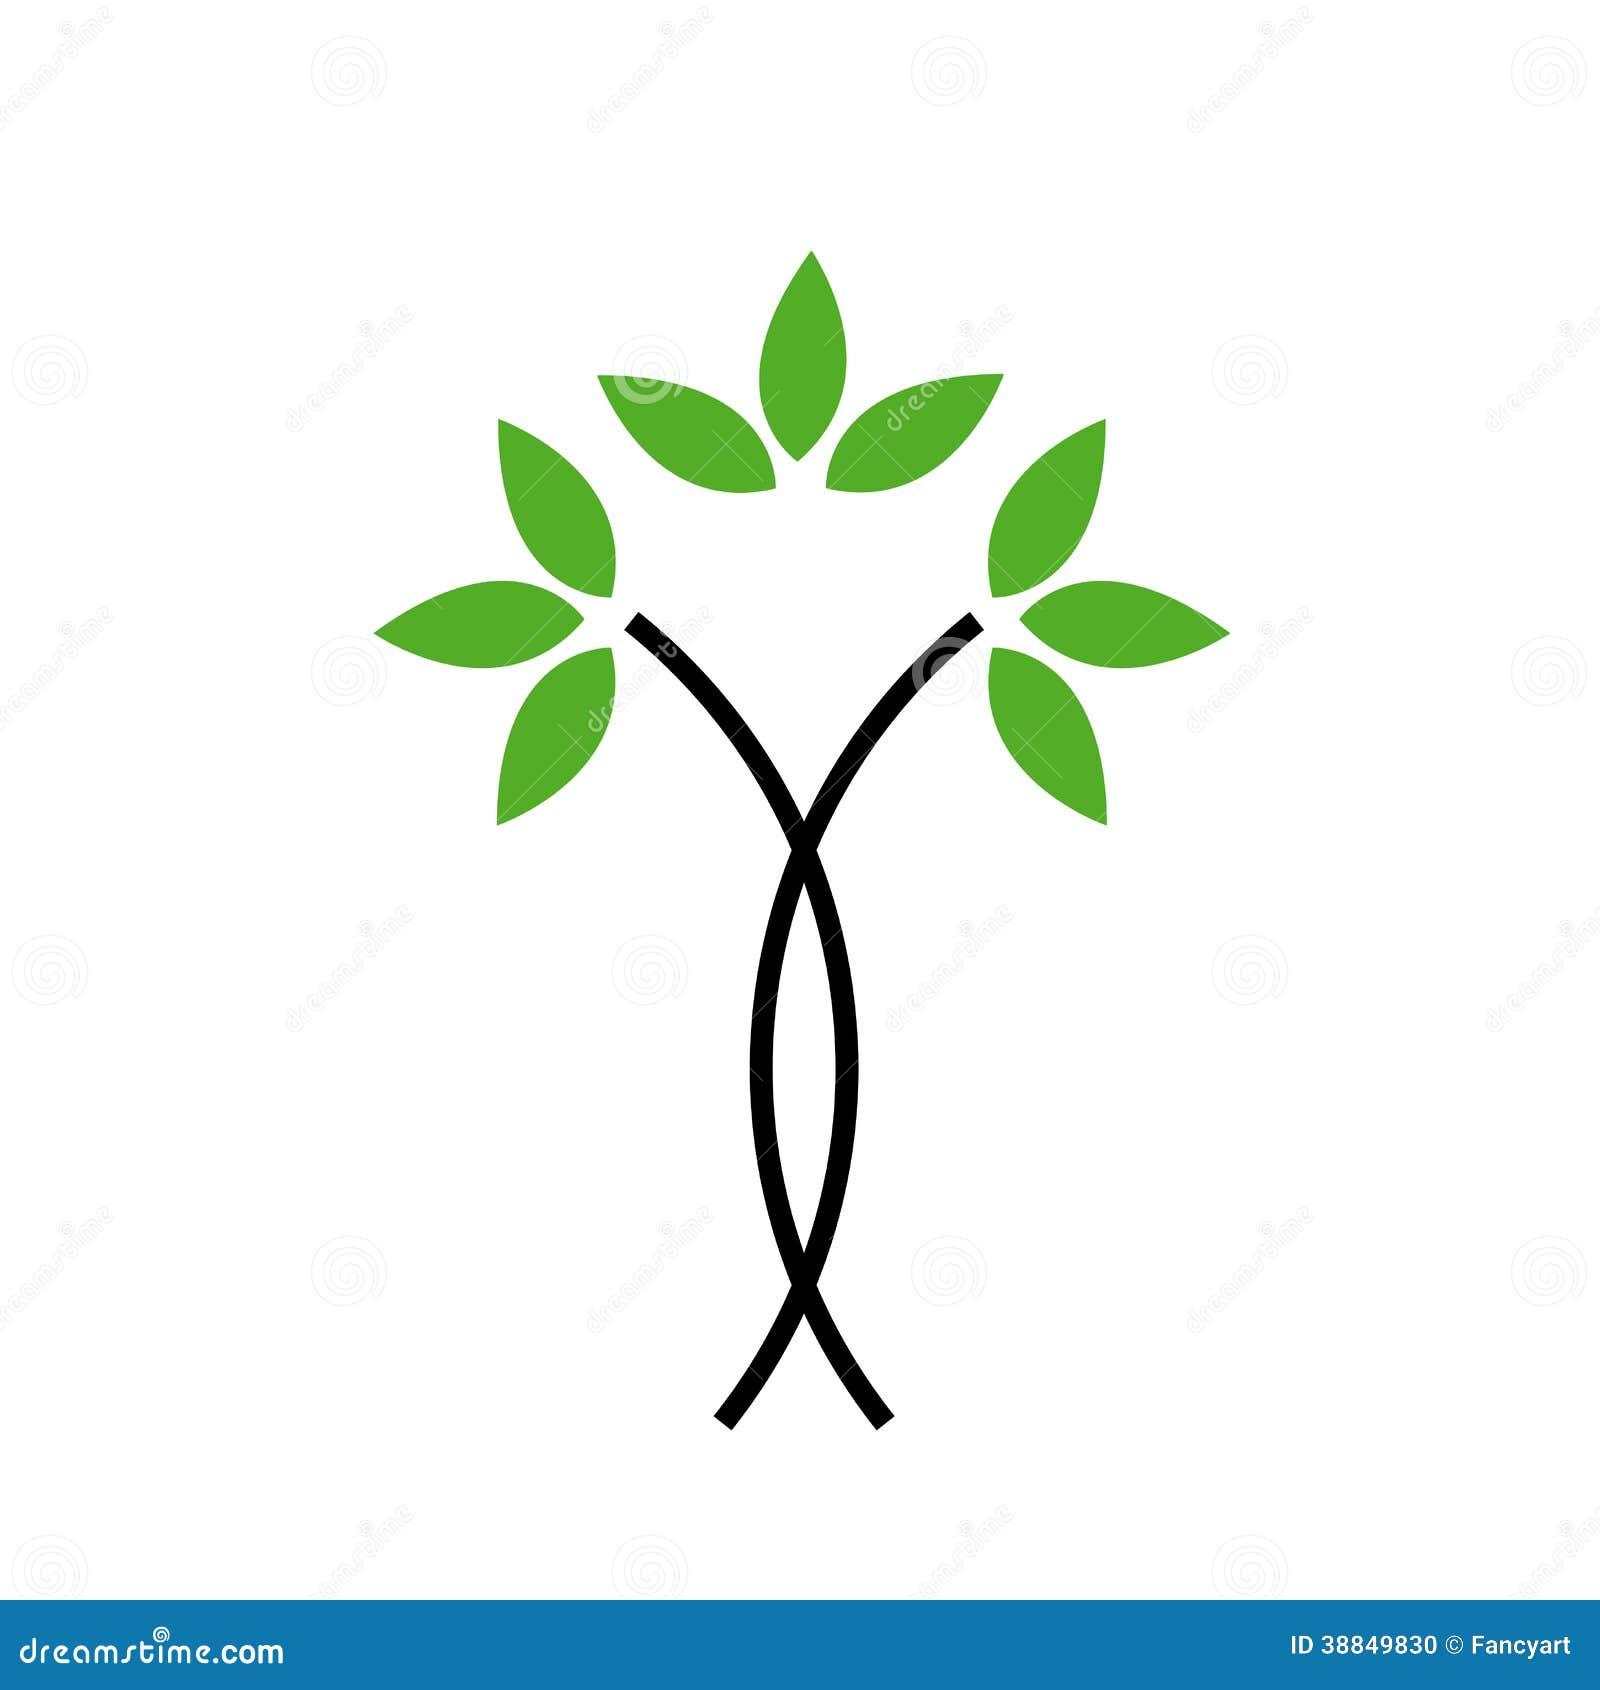 Abstract Tree Logo Stock Vector - Image: 38849830